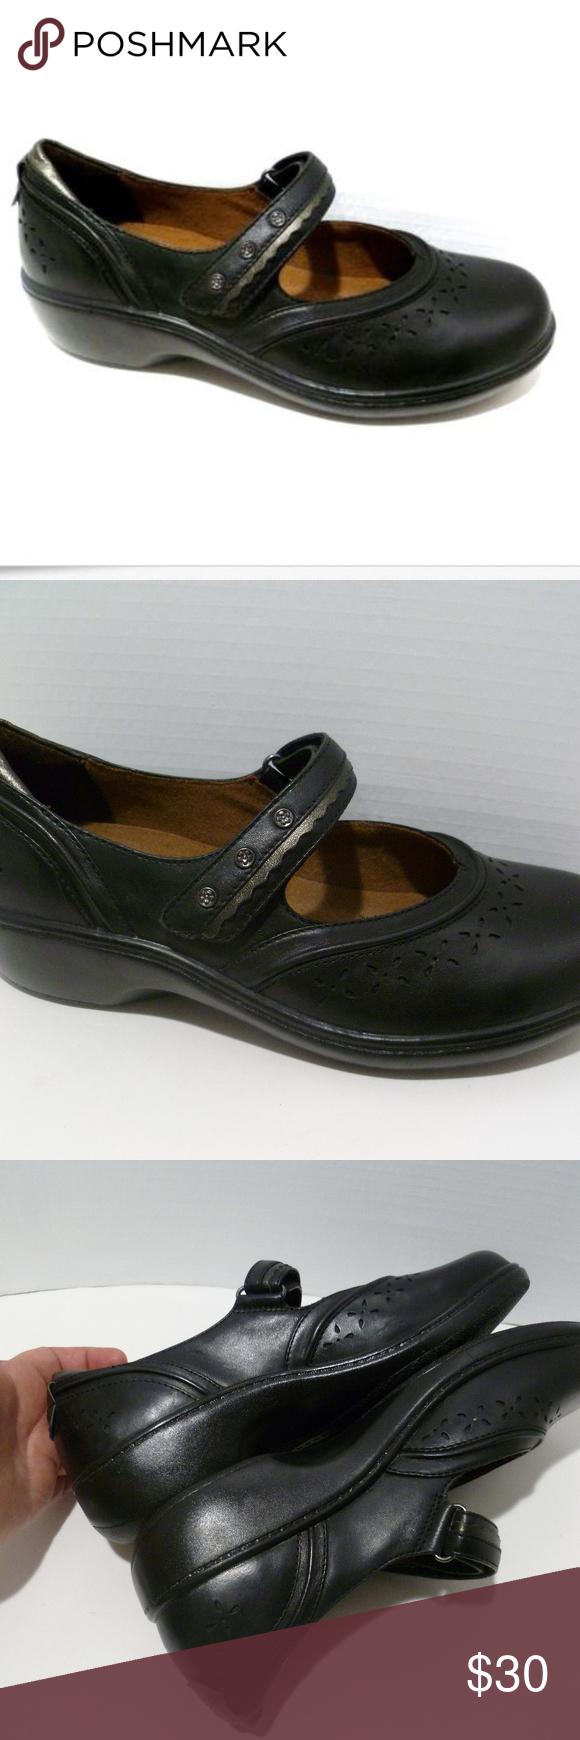 64b361755cf63 Aravon New Balance Black Mary Jane Shoe Aravon by New Balance ...